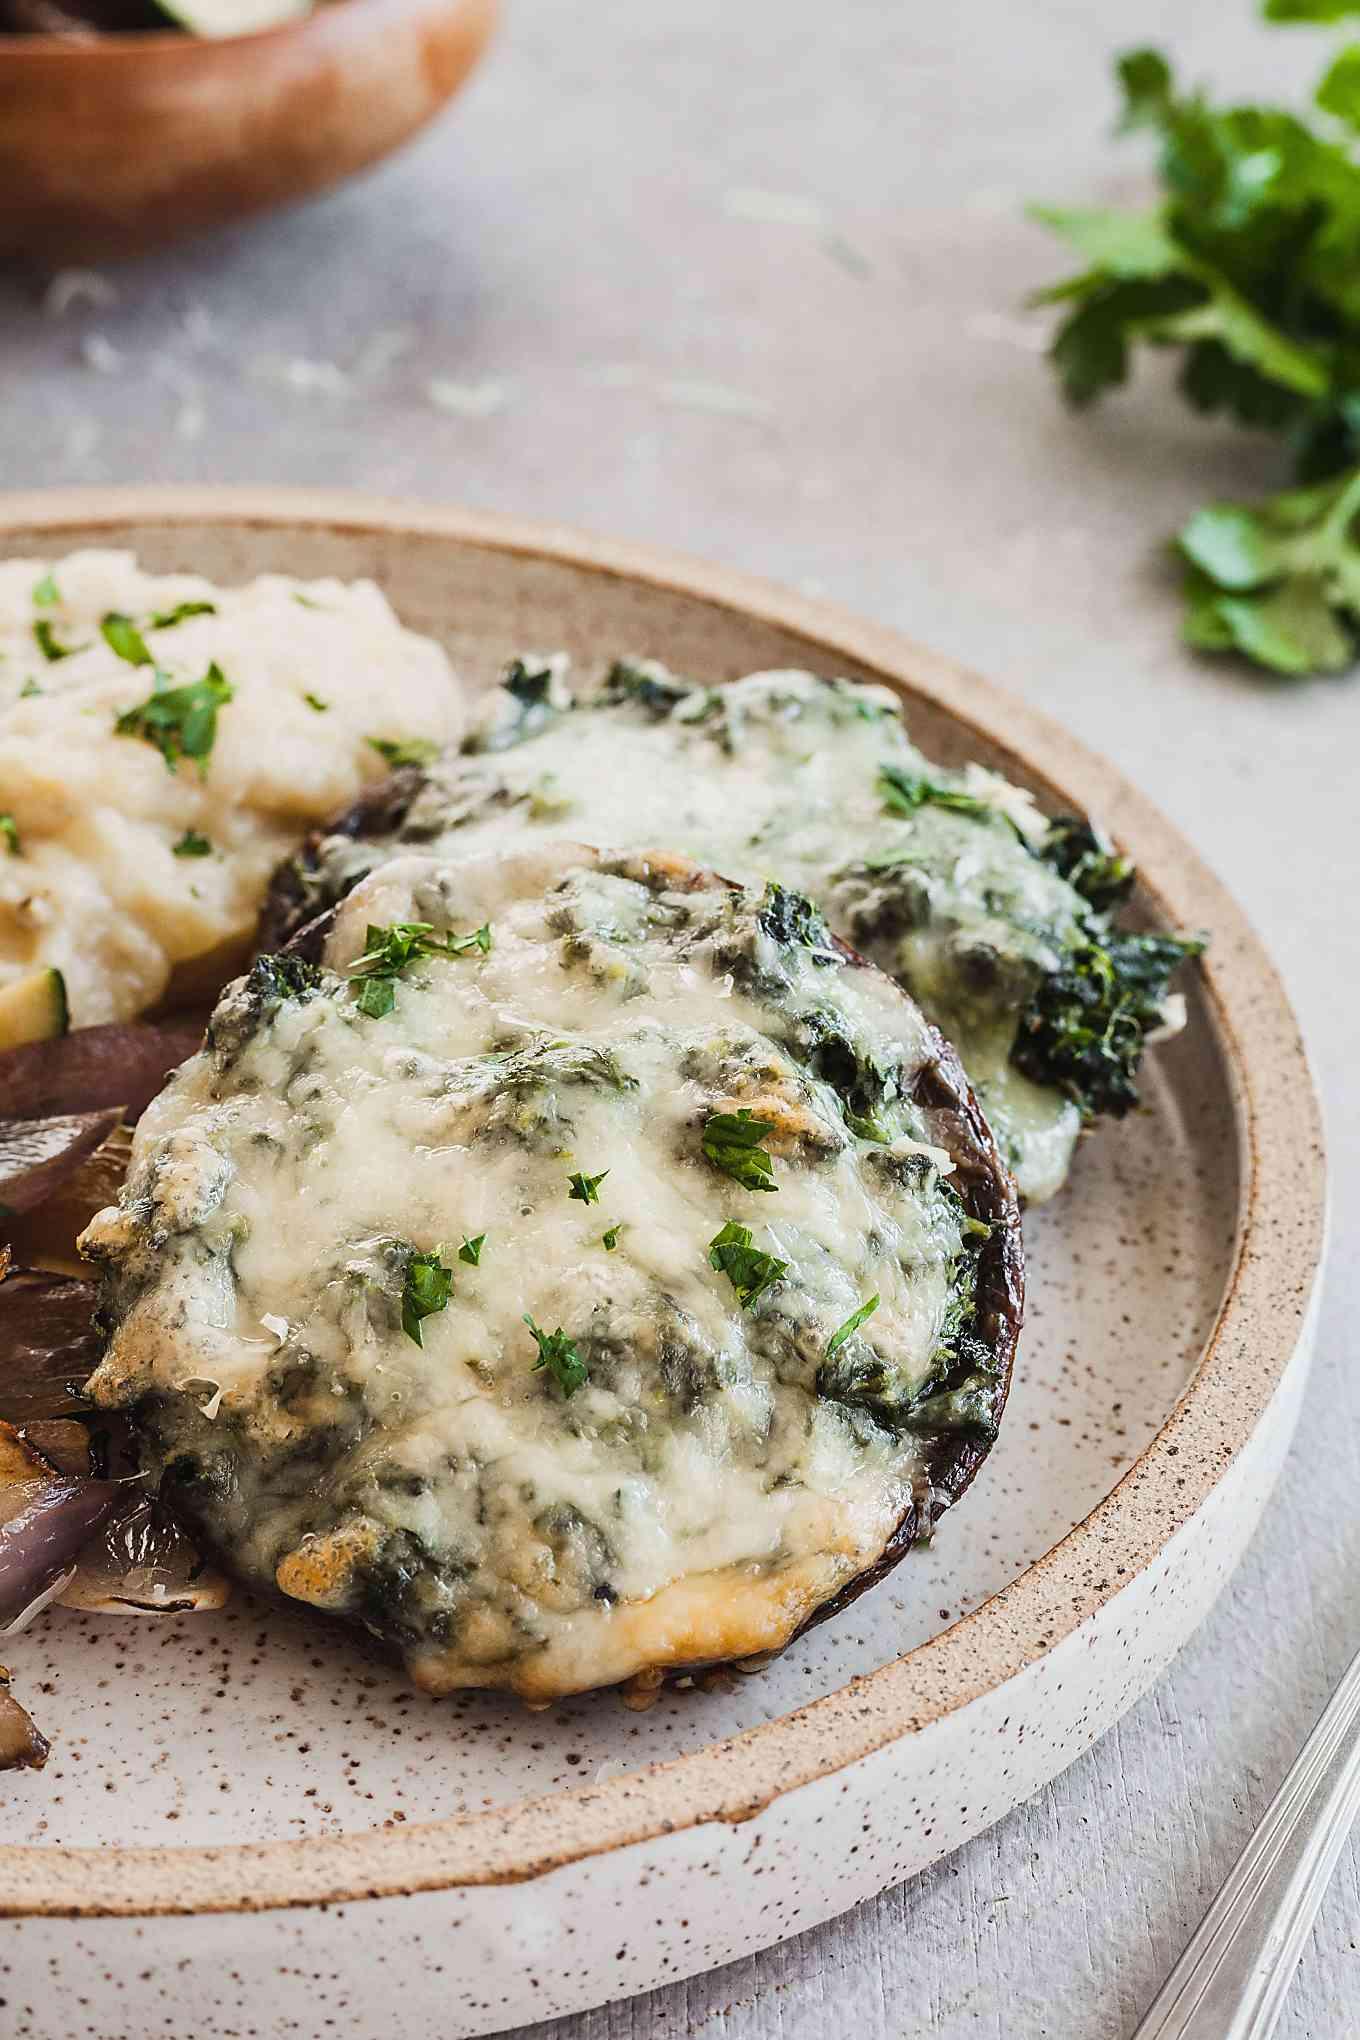 spinach stuffed portobello mushrooms on a speckled plate